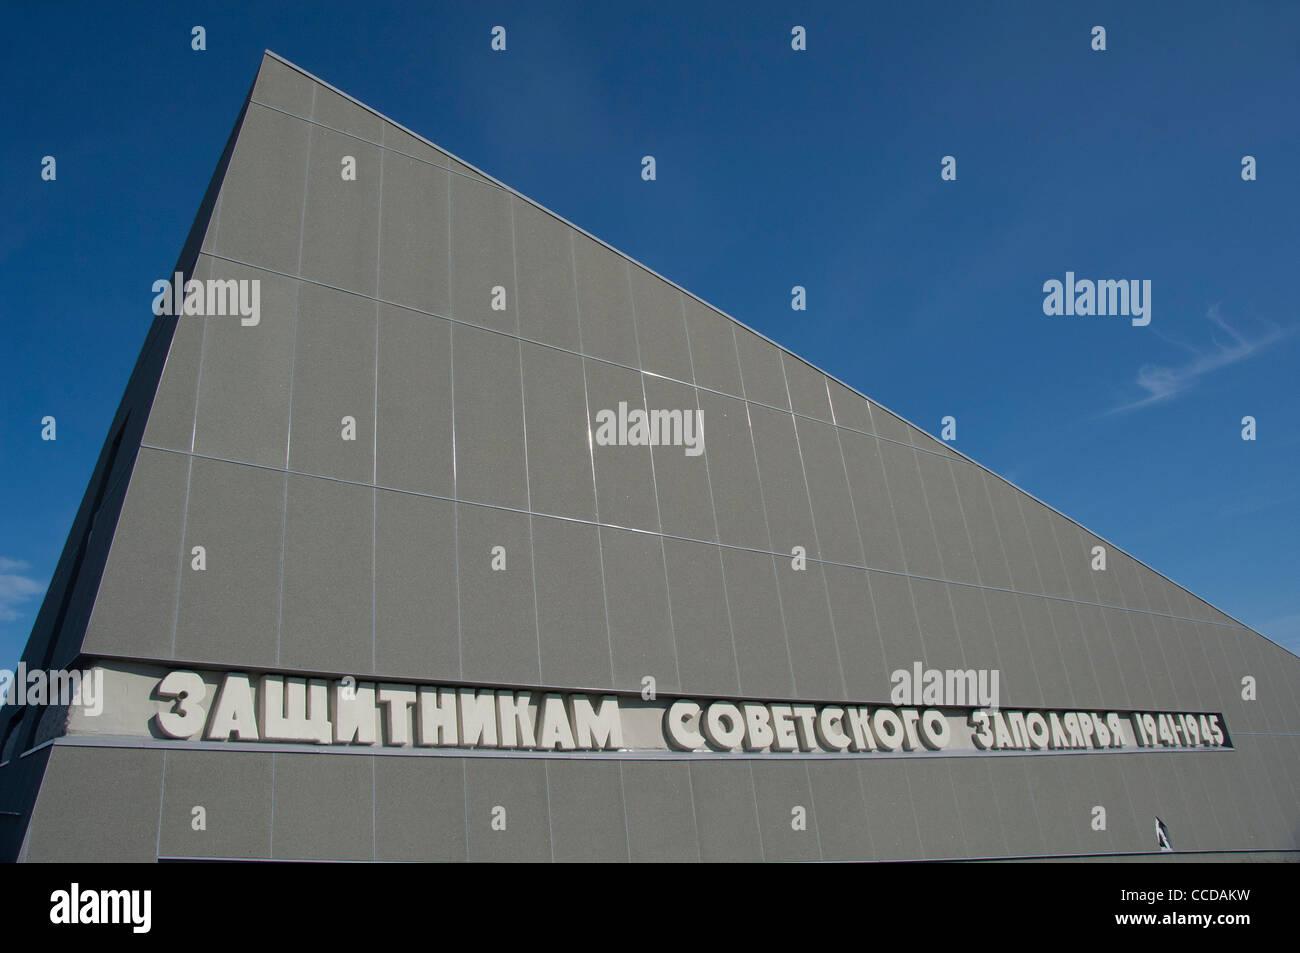 Russia, Murmansk. Largest city north of the Arctic Circle. Aloysha Monument, massive sign. - Stock Image